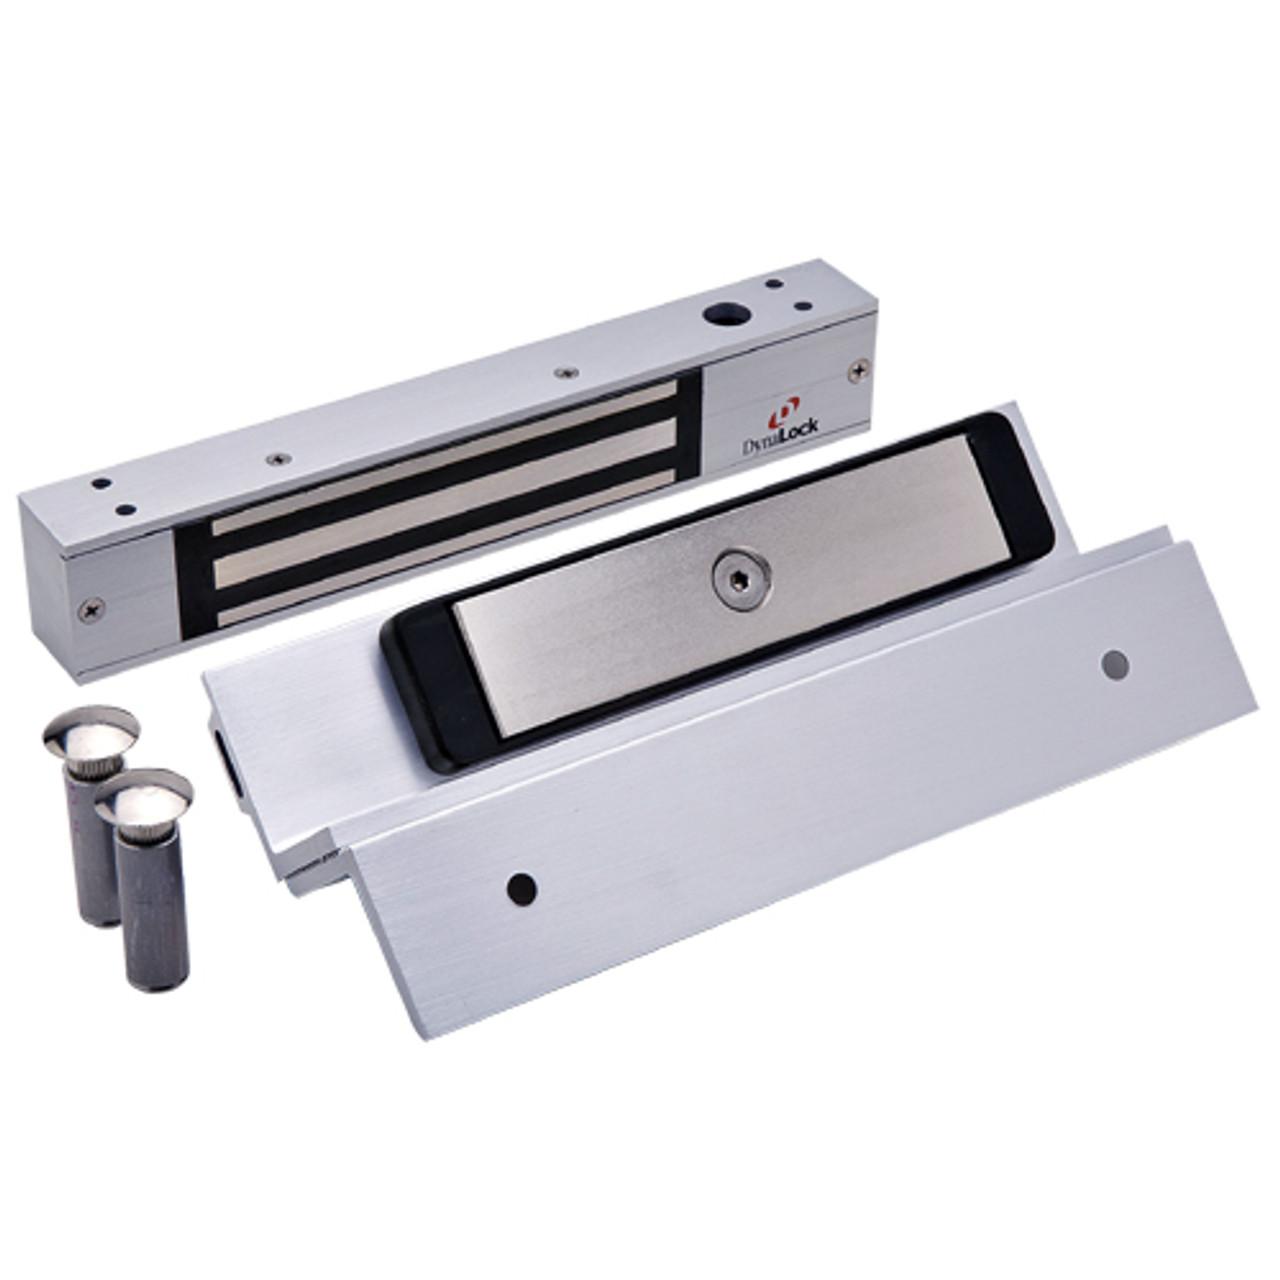 2511TJ-US26 DynaLock 2500 Series 650 LB Mini-Mag Single Electromagnetic Lock for Inswing Door in Bright Chrome